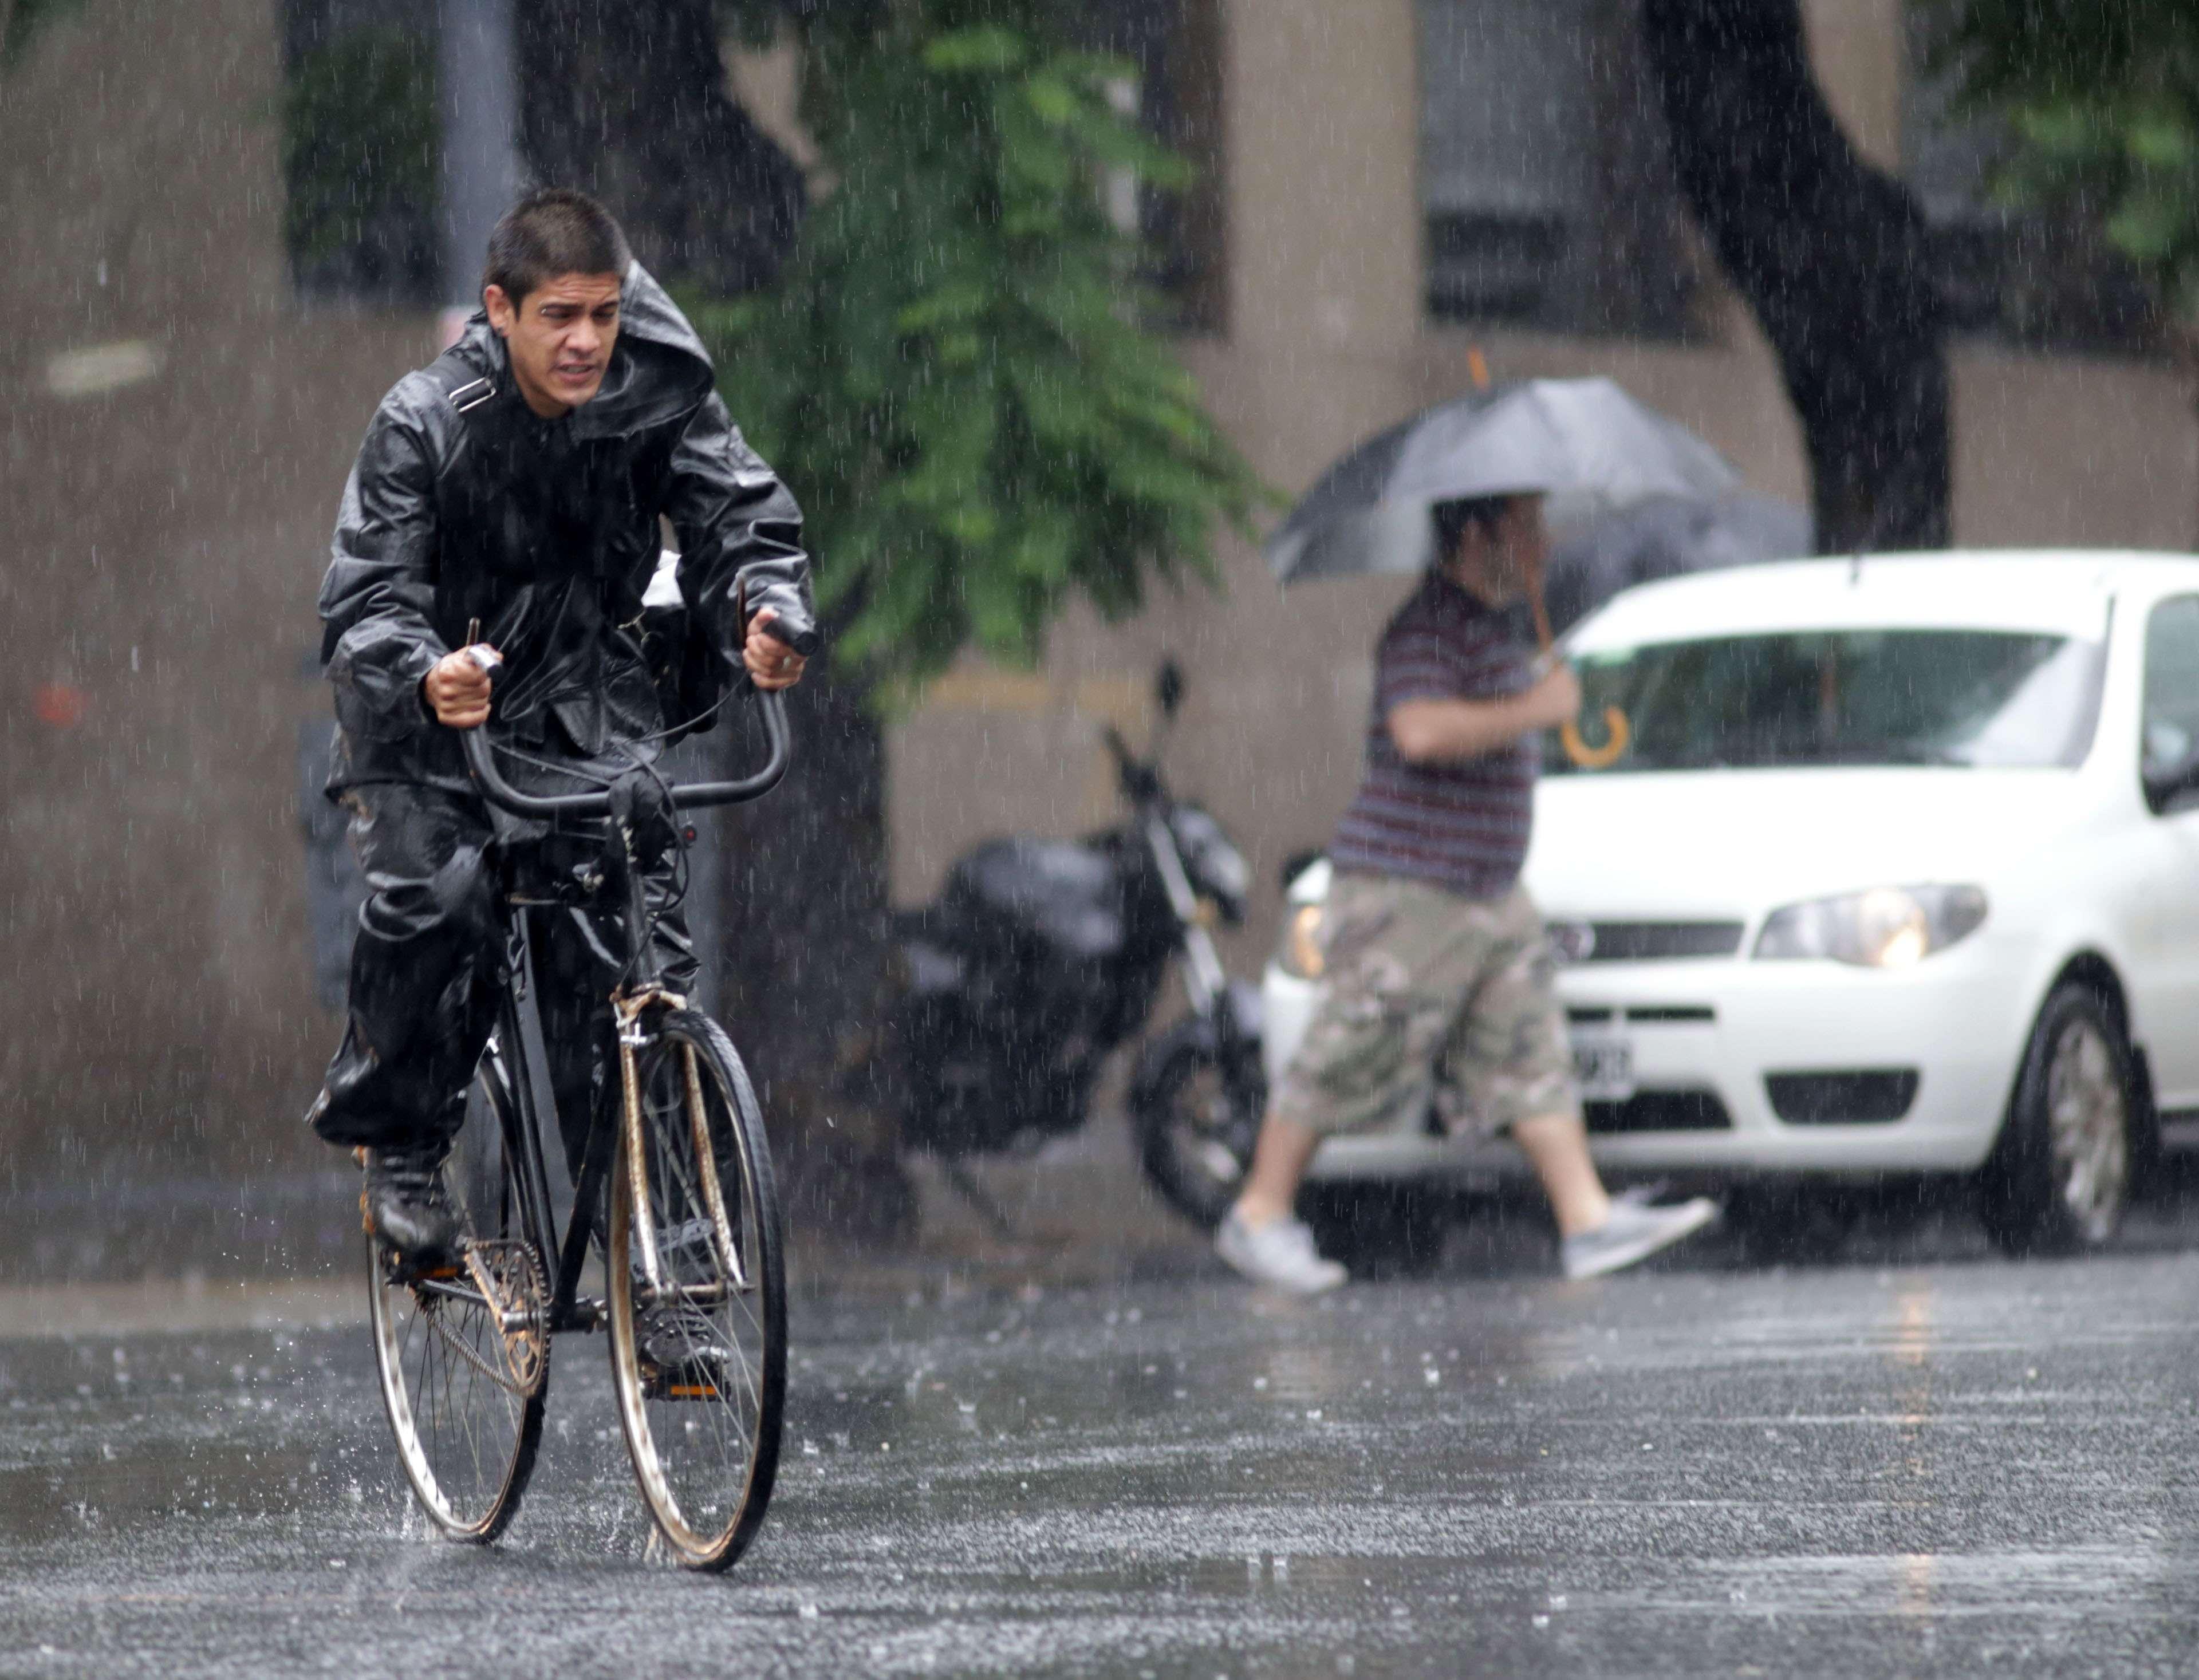 Luego de varios días de intenso calor, llegan las lluvias a Buenos Aires. Foto: NA